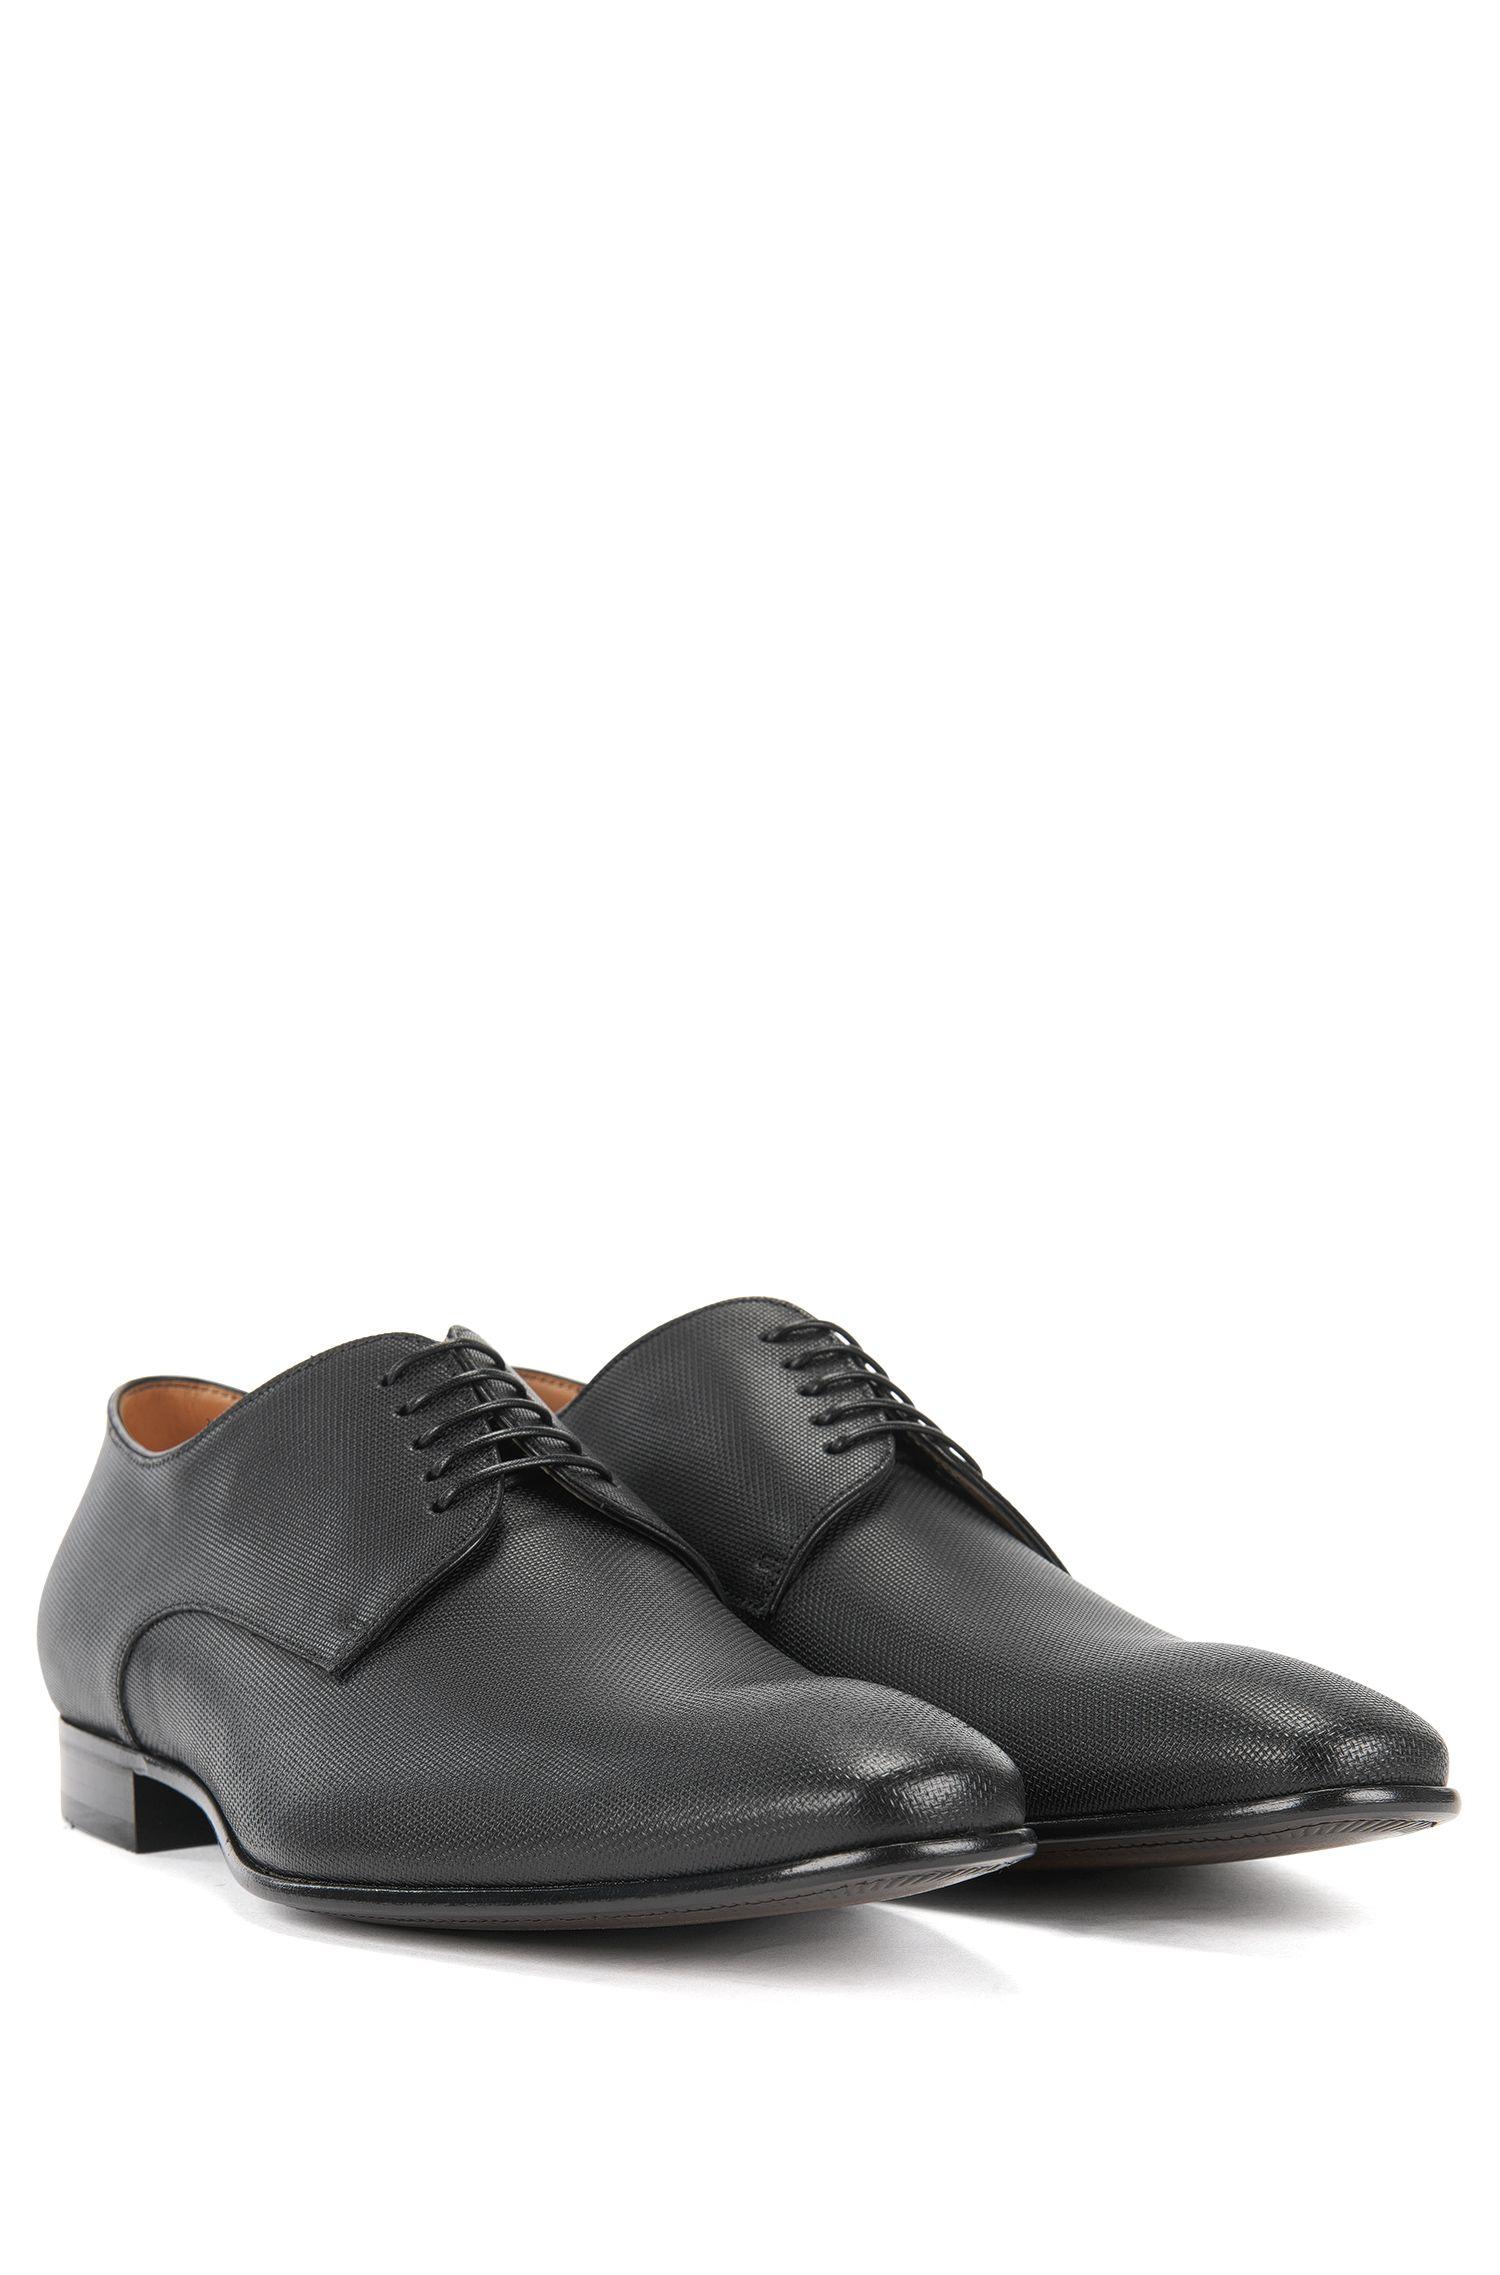 BOSS Hugo Boss Italian Leather Derby Dress Shoe Prindo 11.5 Black